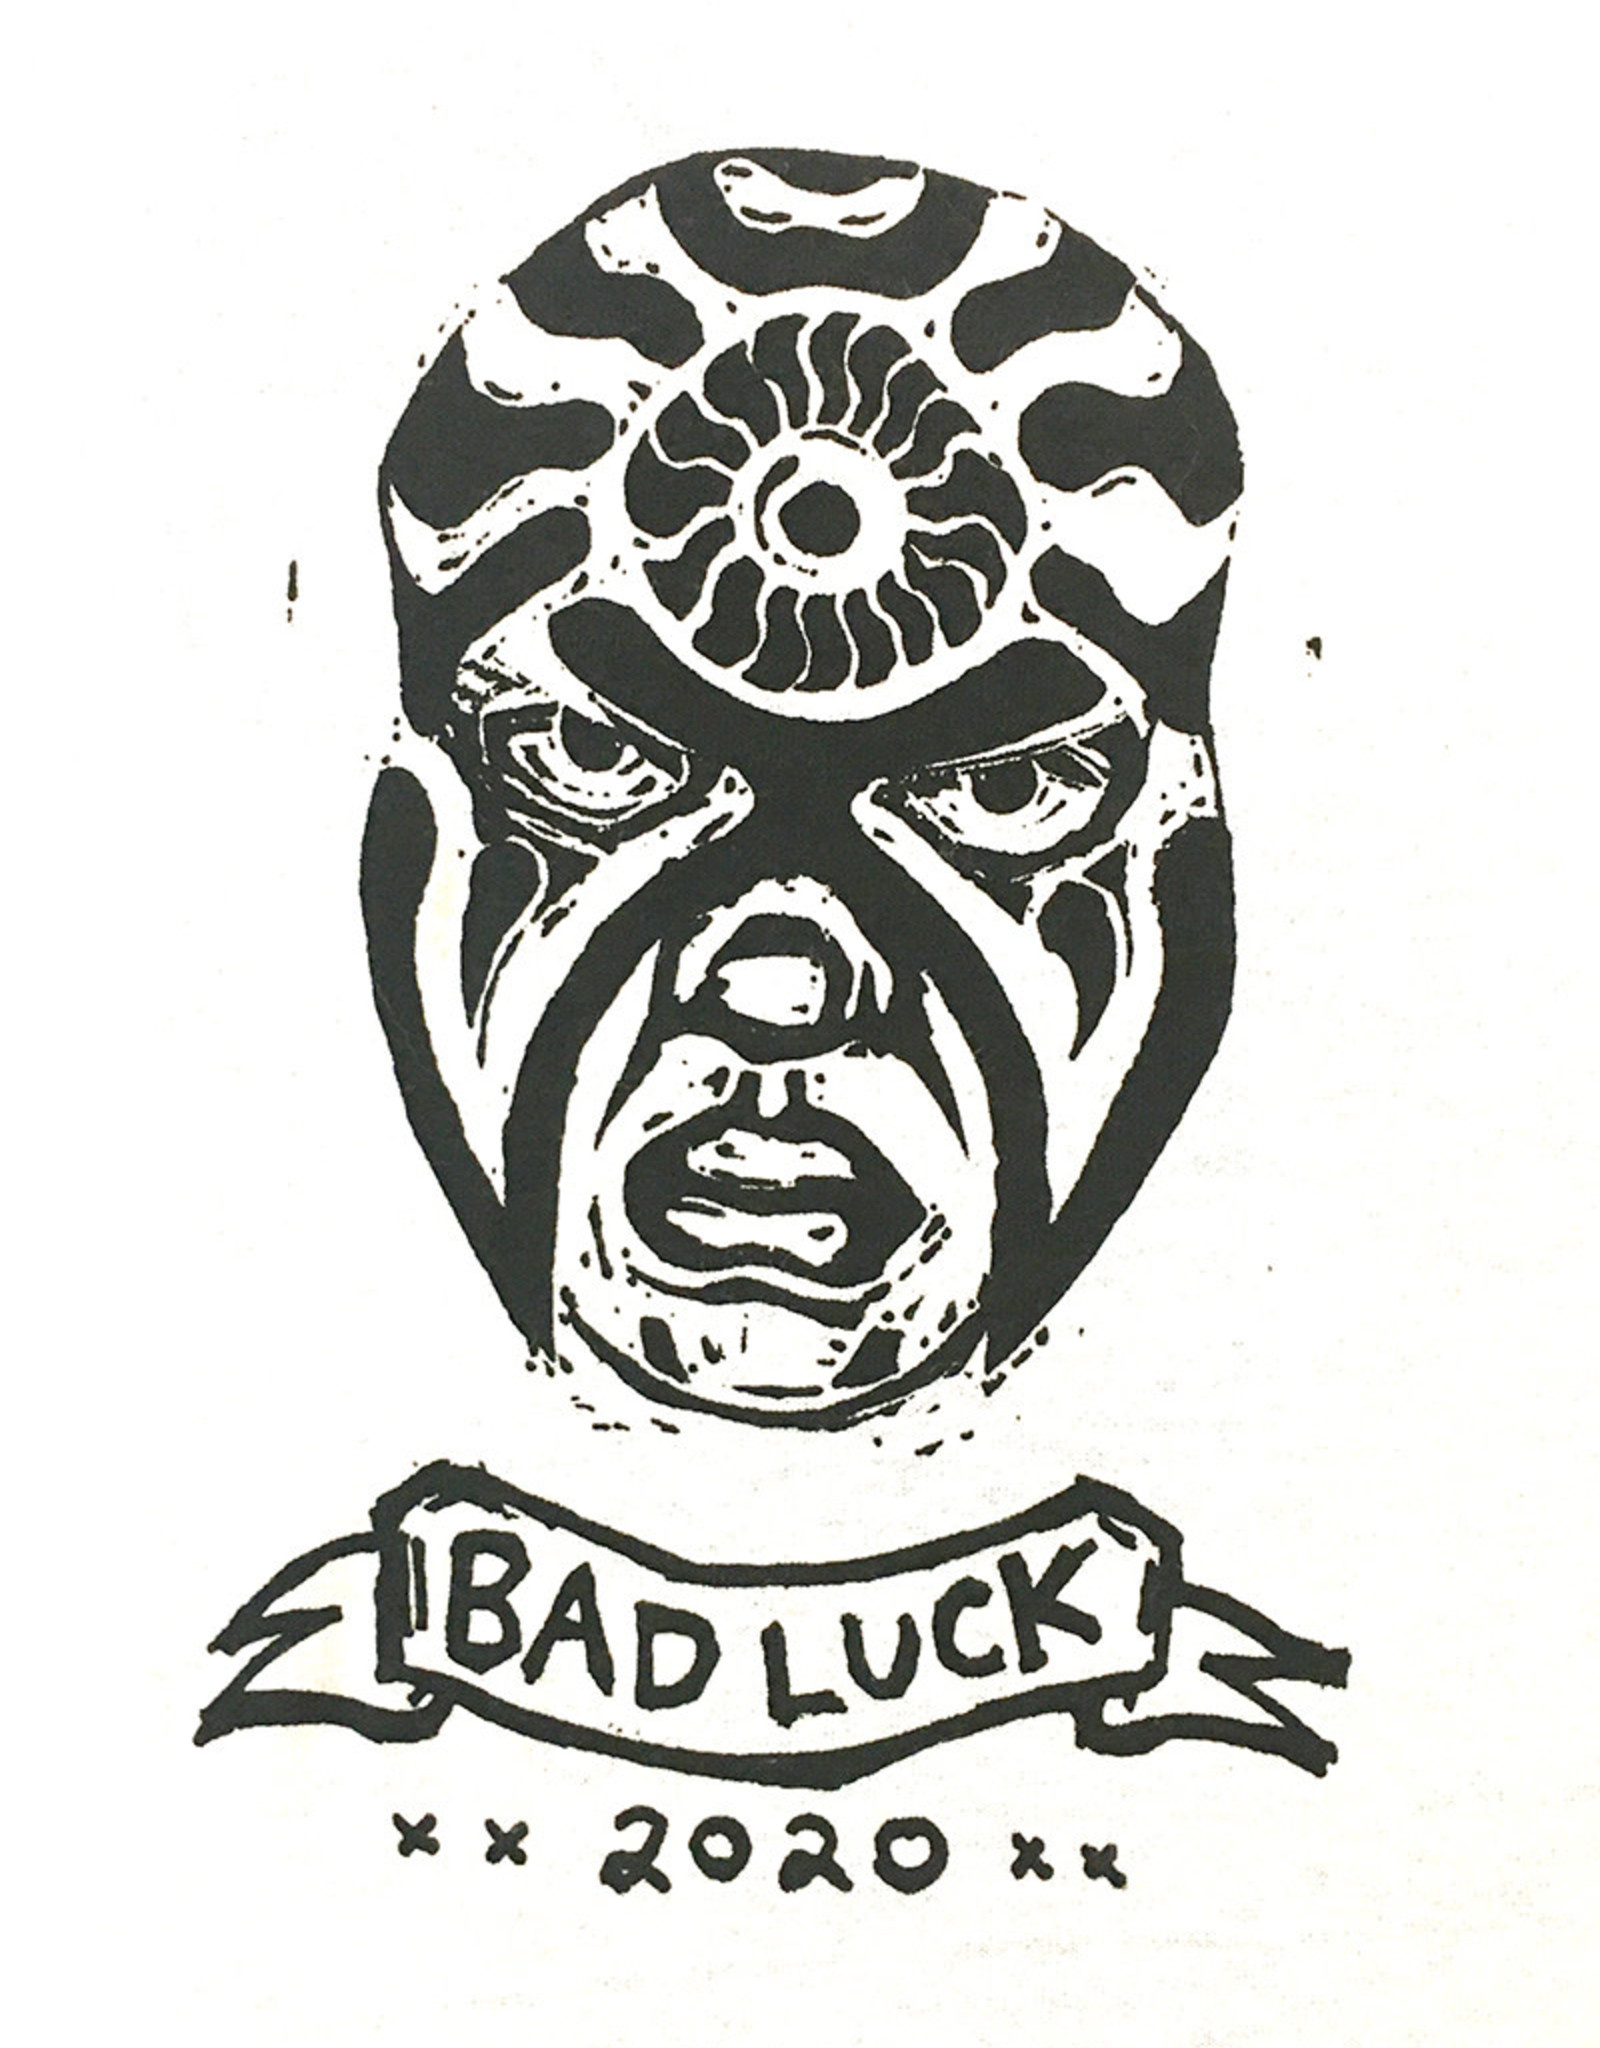 Paul Punzo Bad Luck 2020 Tee by Paul Punzo